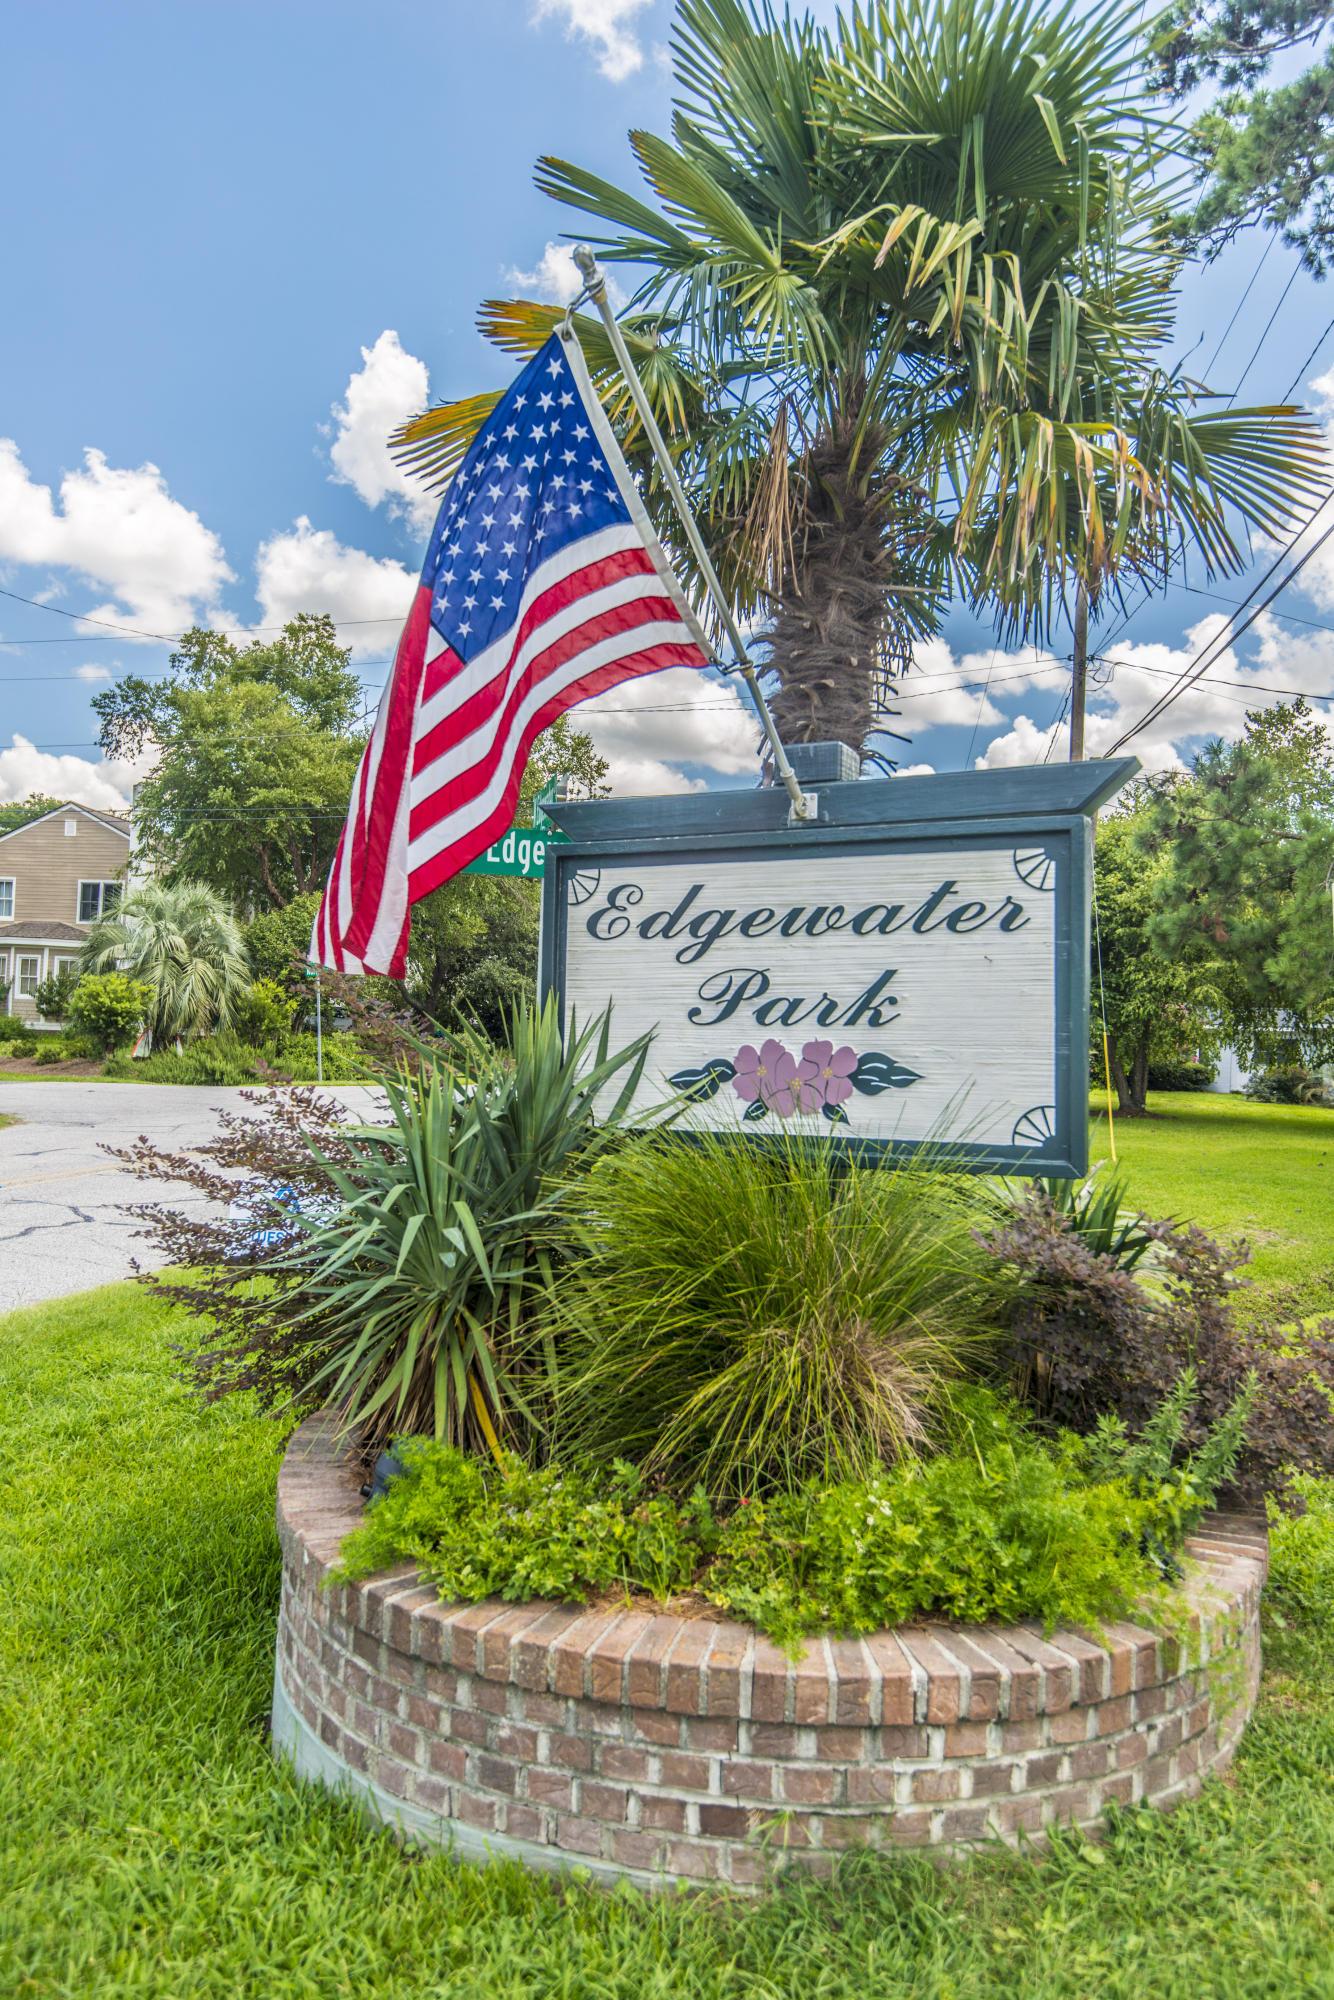 1367 N Edgewater Dr Charleston, SC 29407